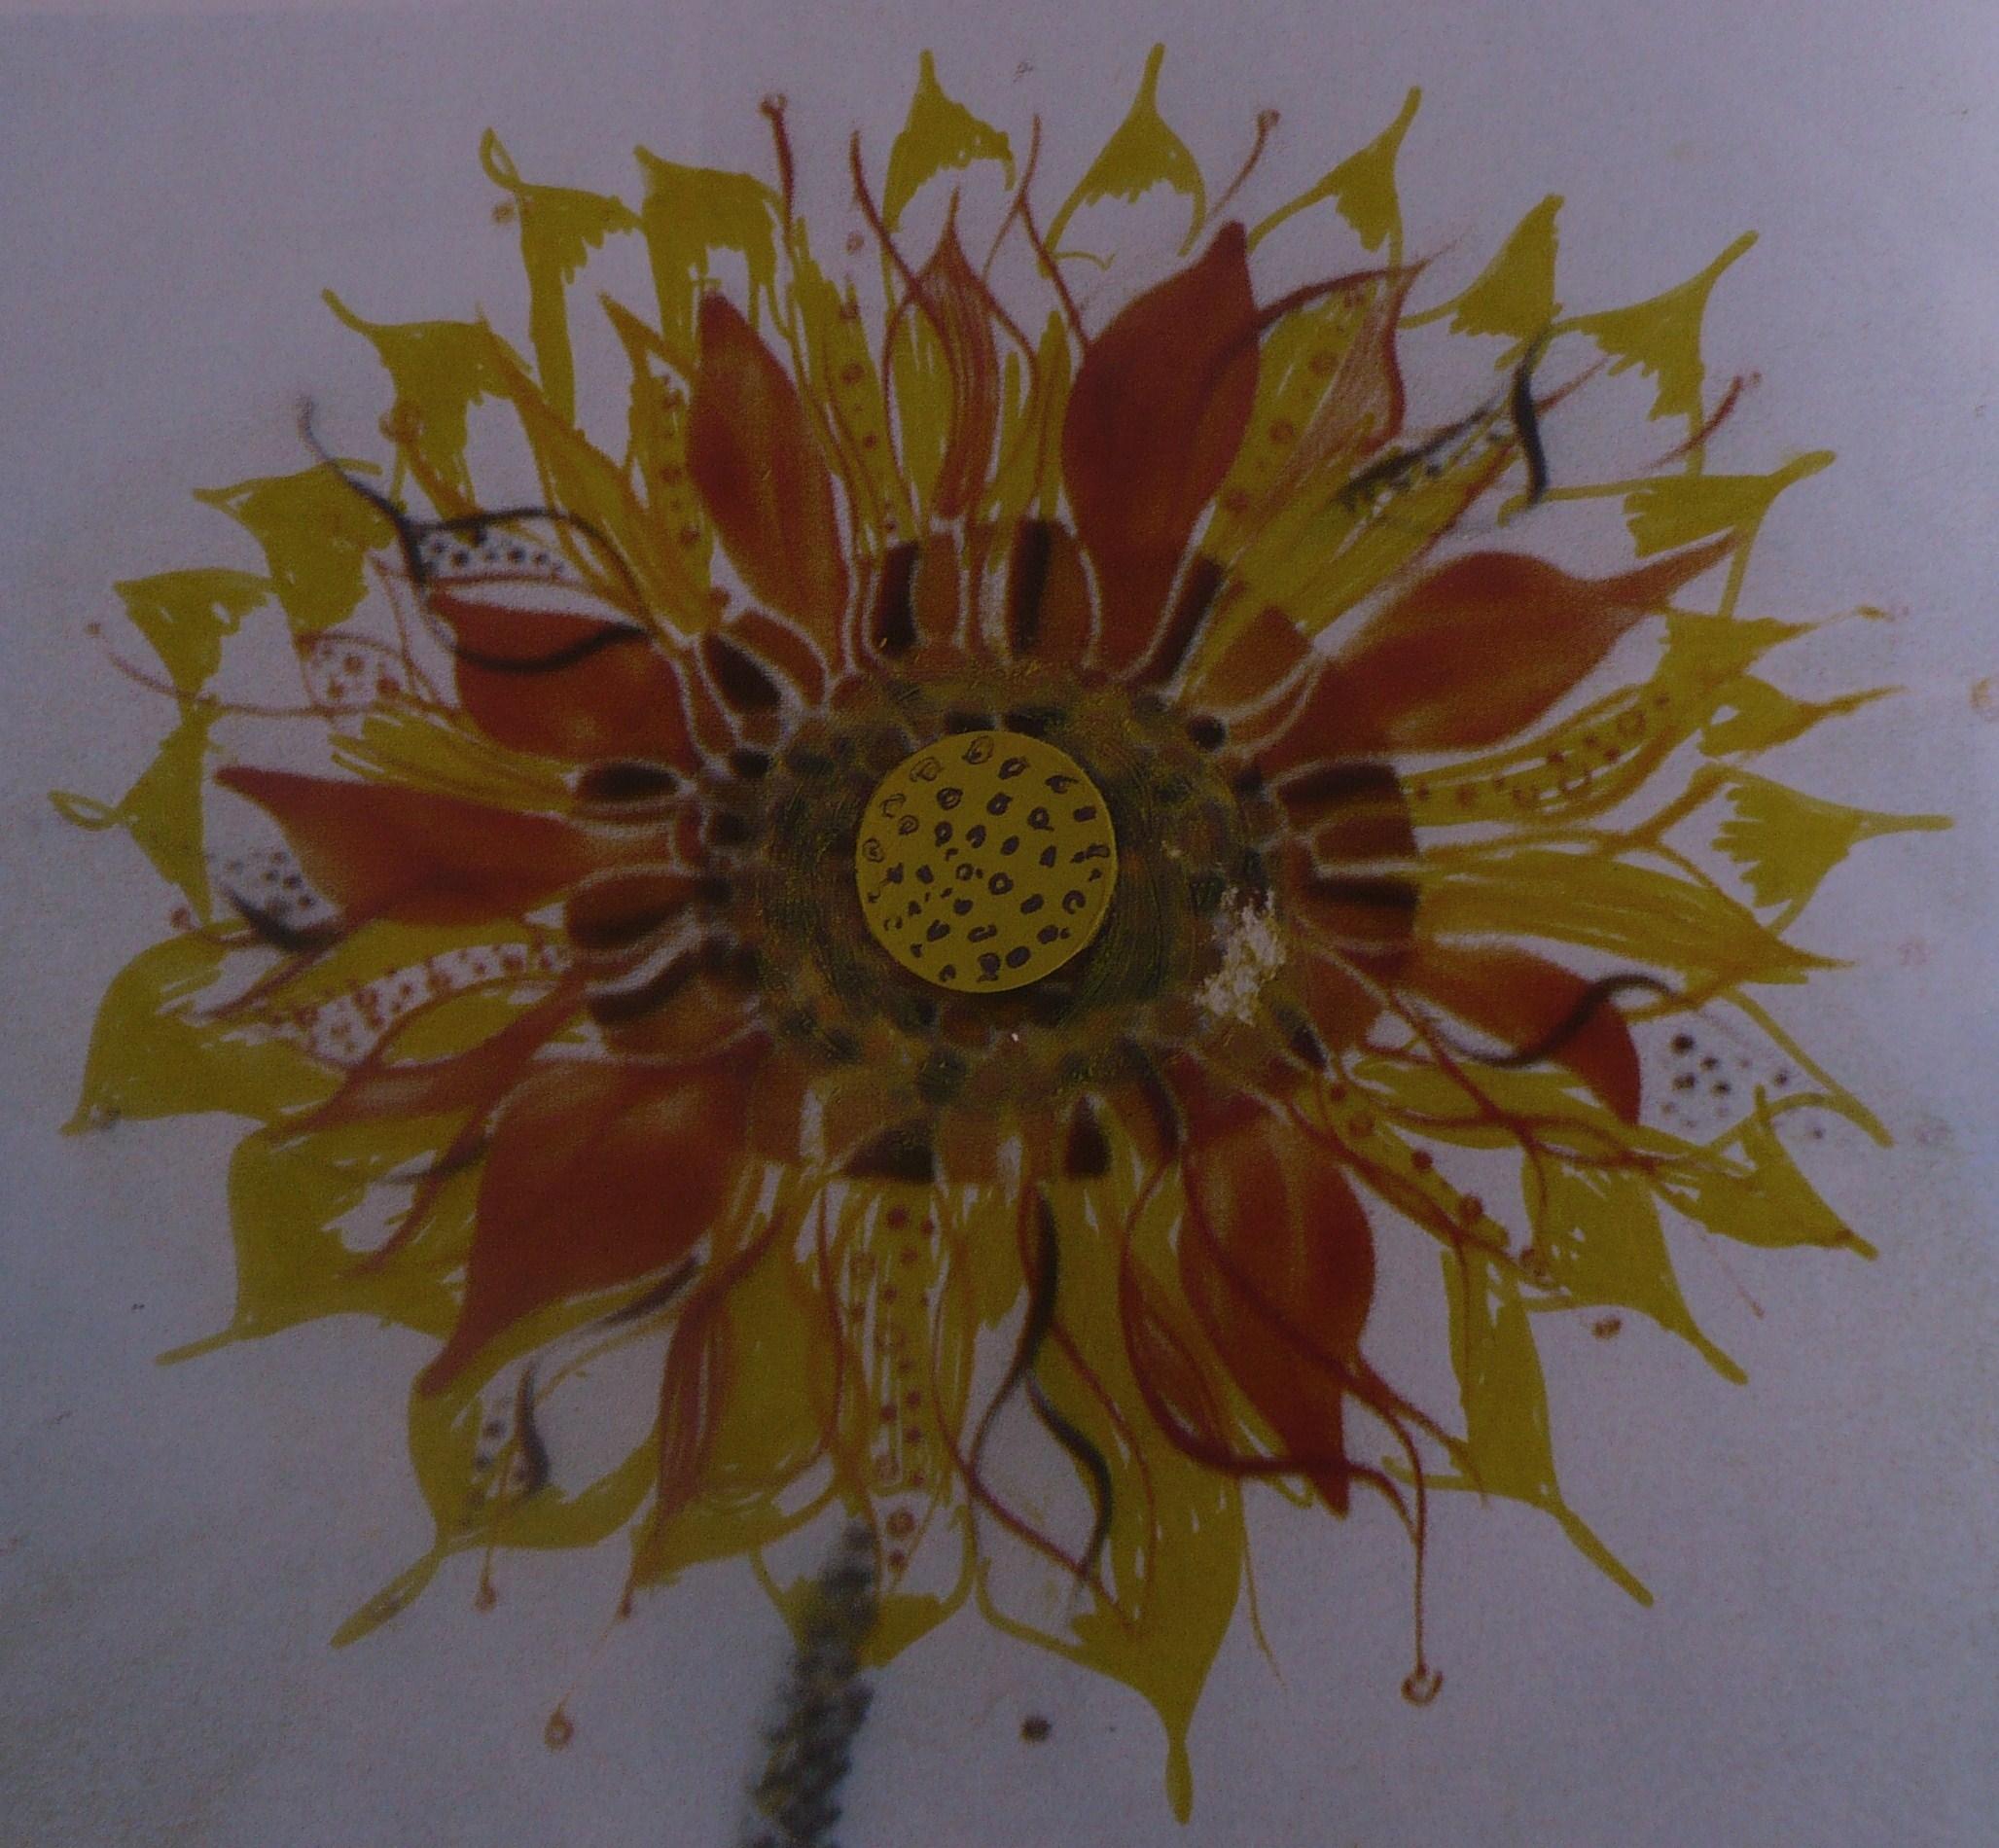 fleur-de-petunia-002.JPG